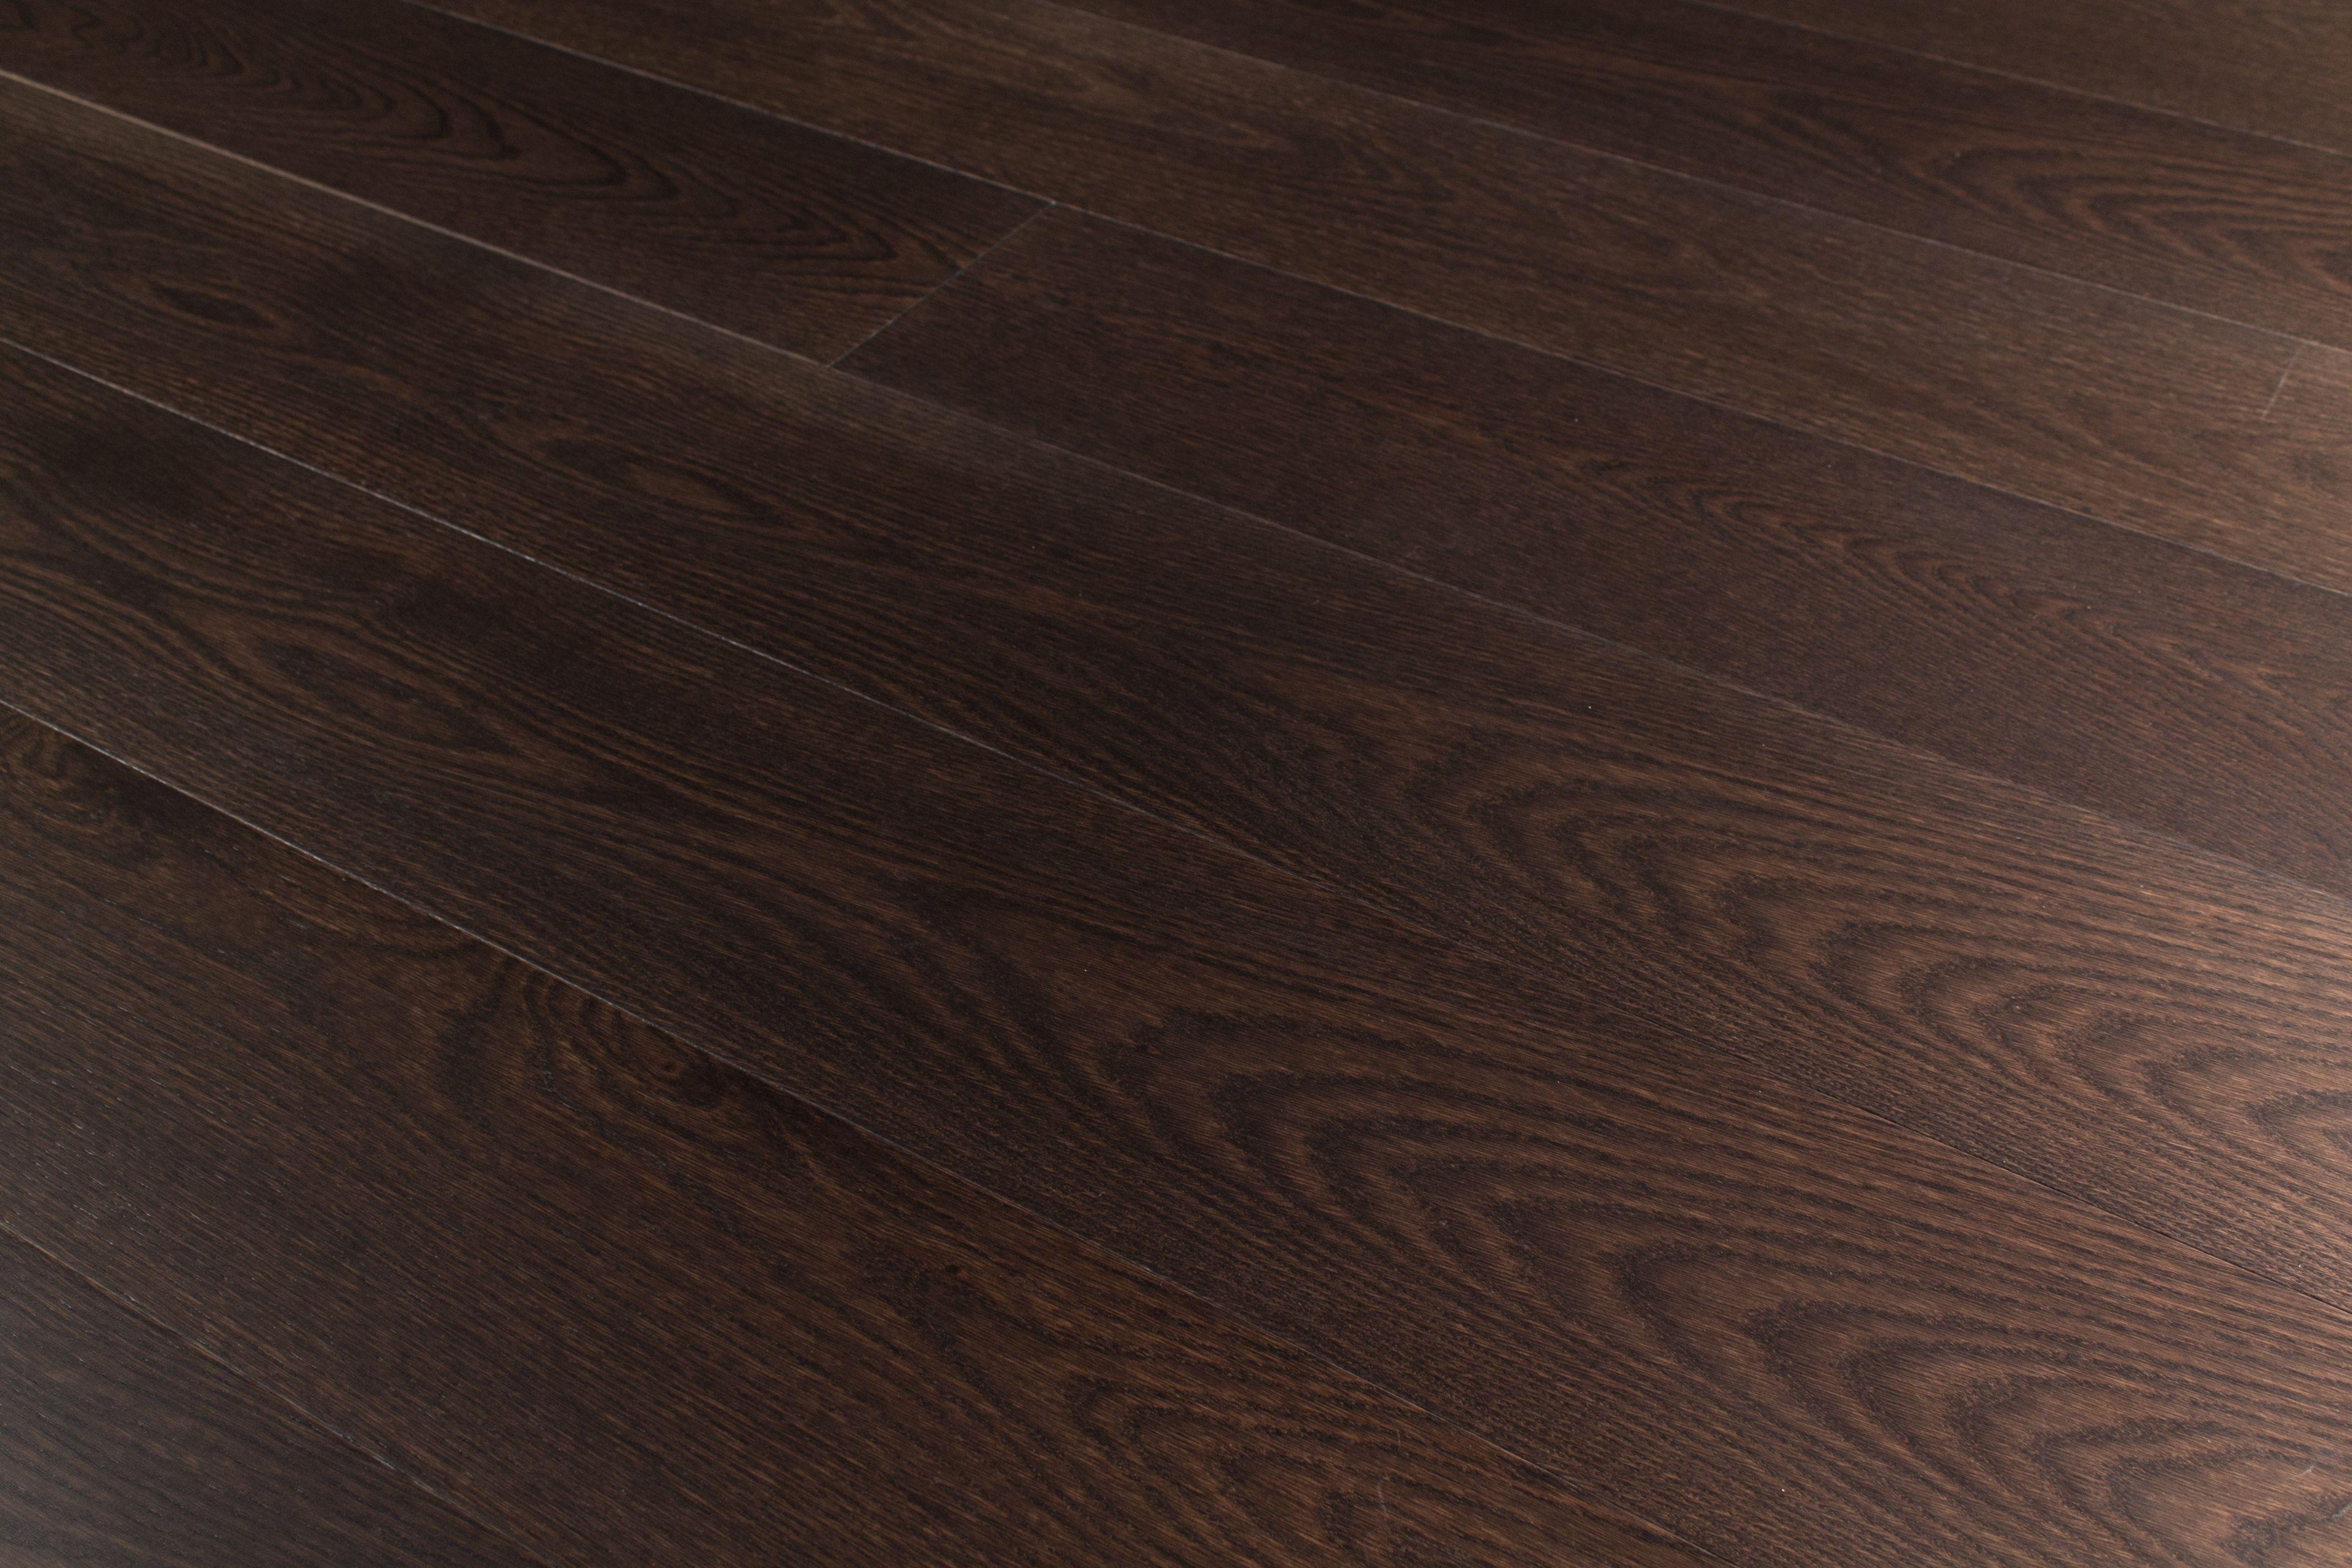 white oak grey hardwood flooring of wide plank flooring wide plank dark brown white oak hdf hardwood within wide plank flooring wide plank dark brown white oak hdf hardwood flooring